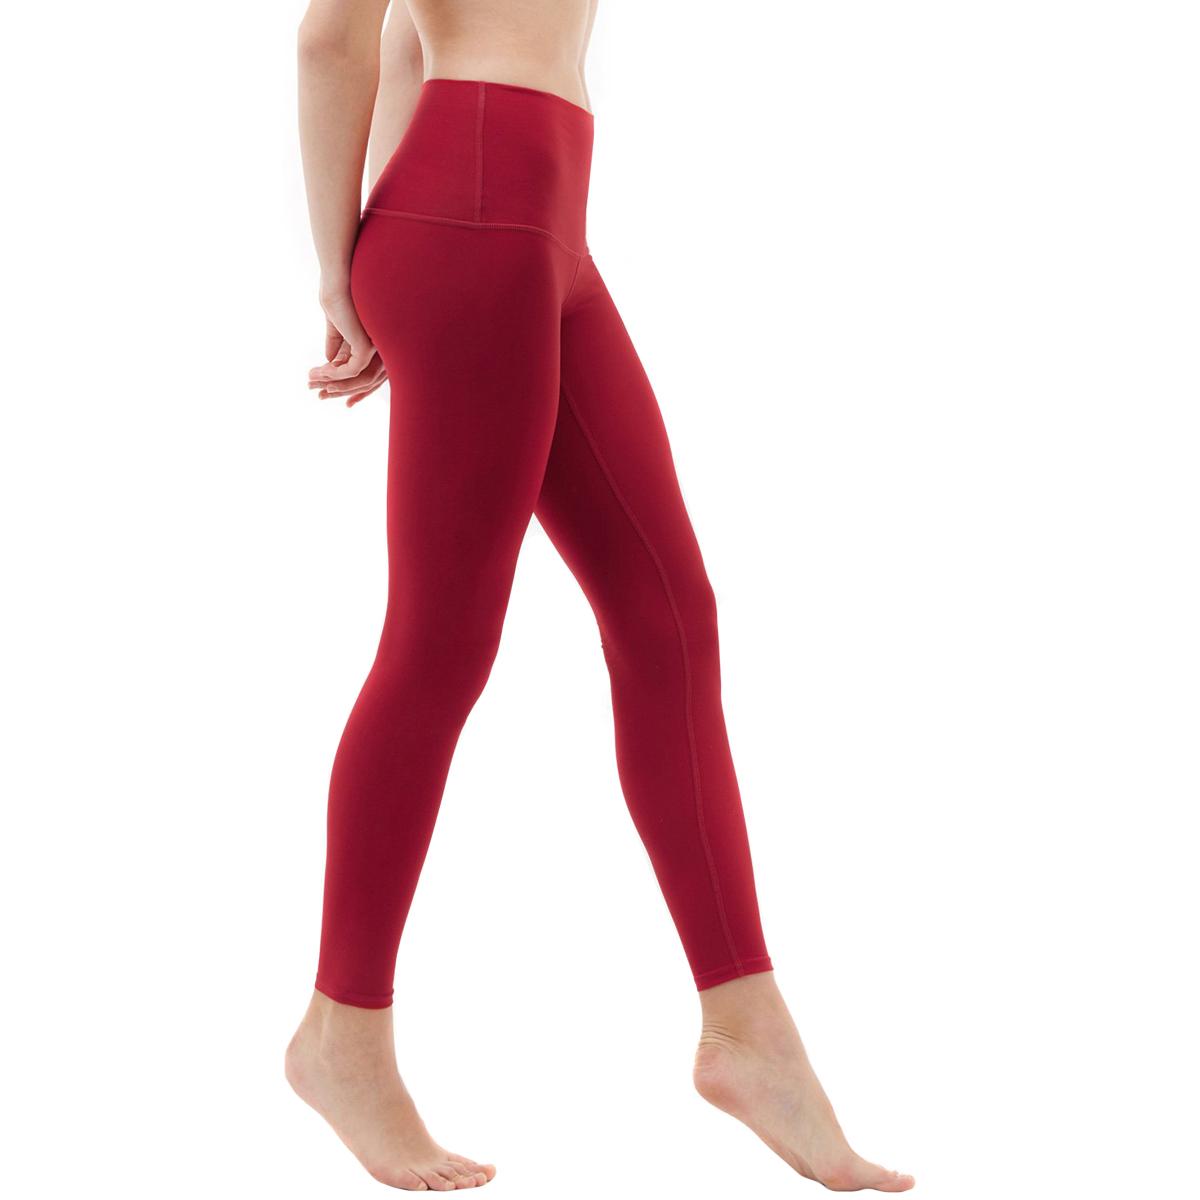 thumbnail 26 - TSLA Tesla FYP52 Women's High-Waisted Ultra-Stretch Tummy Control Yoga Pants